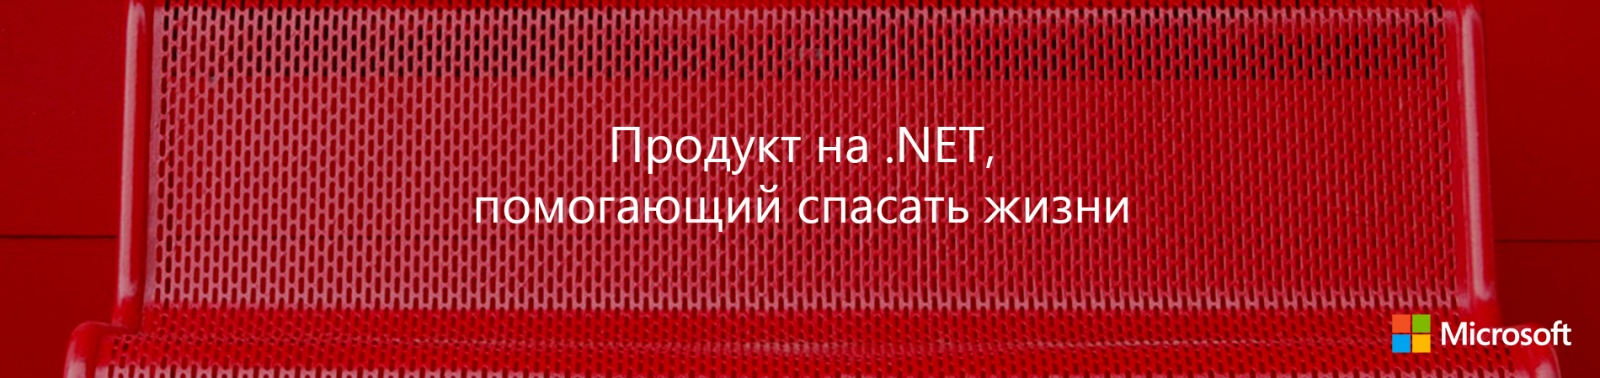 Продукт на .NET, помогающий спасать жизни - 1